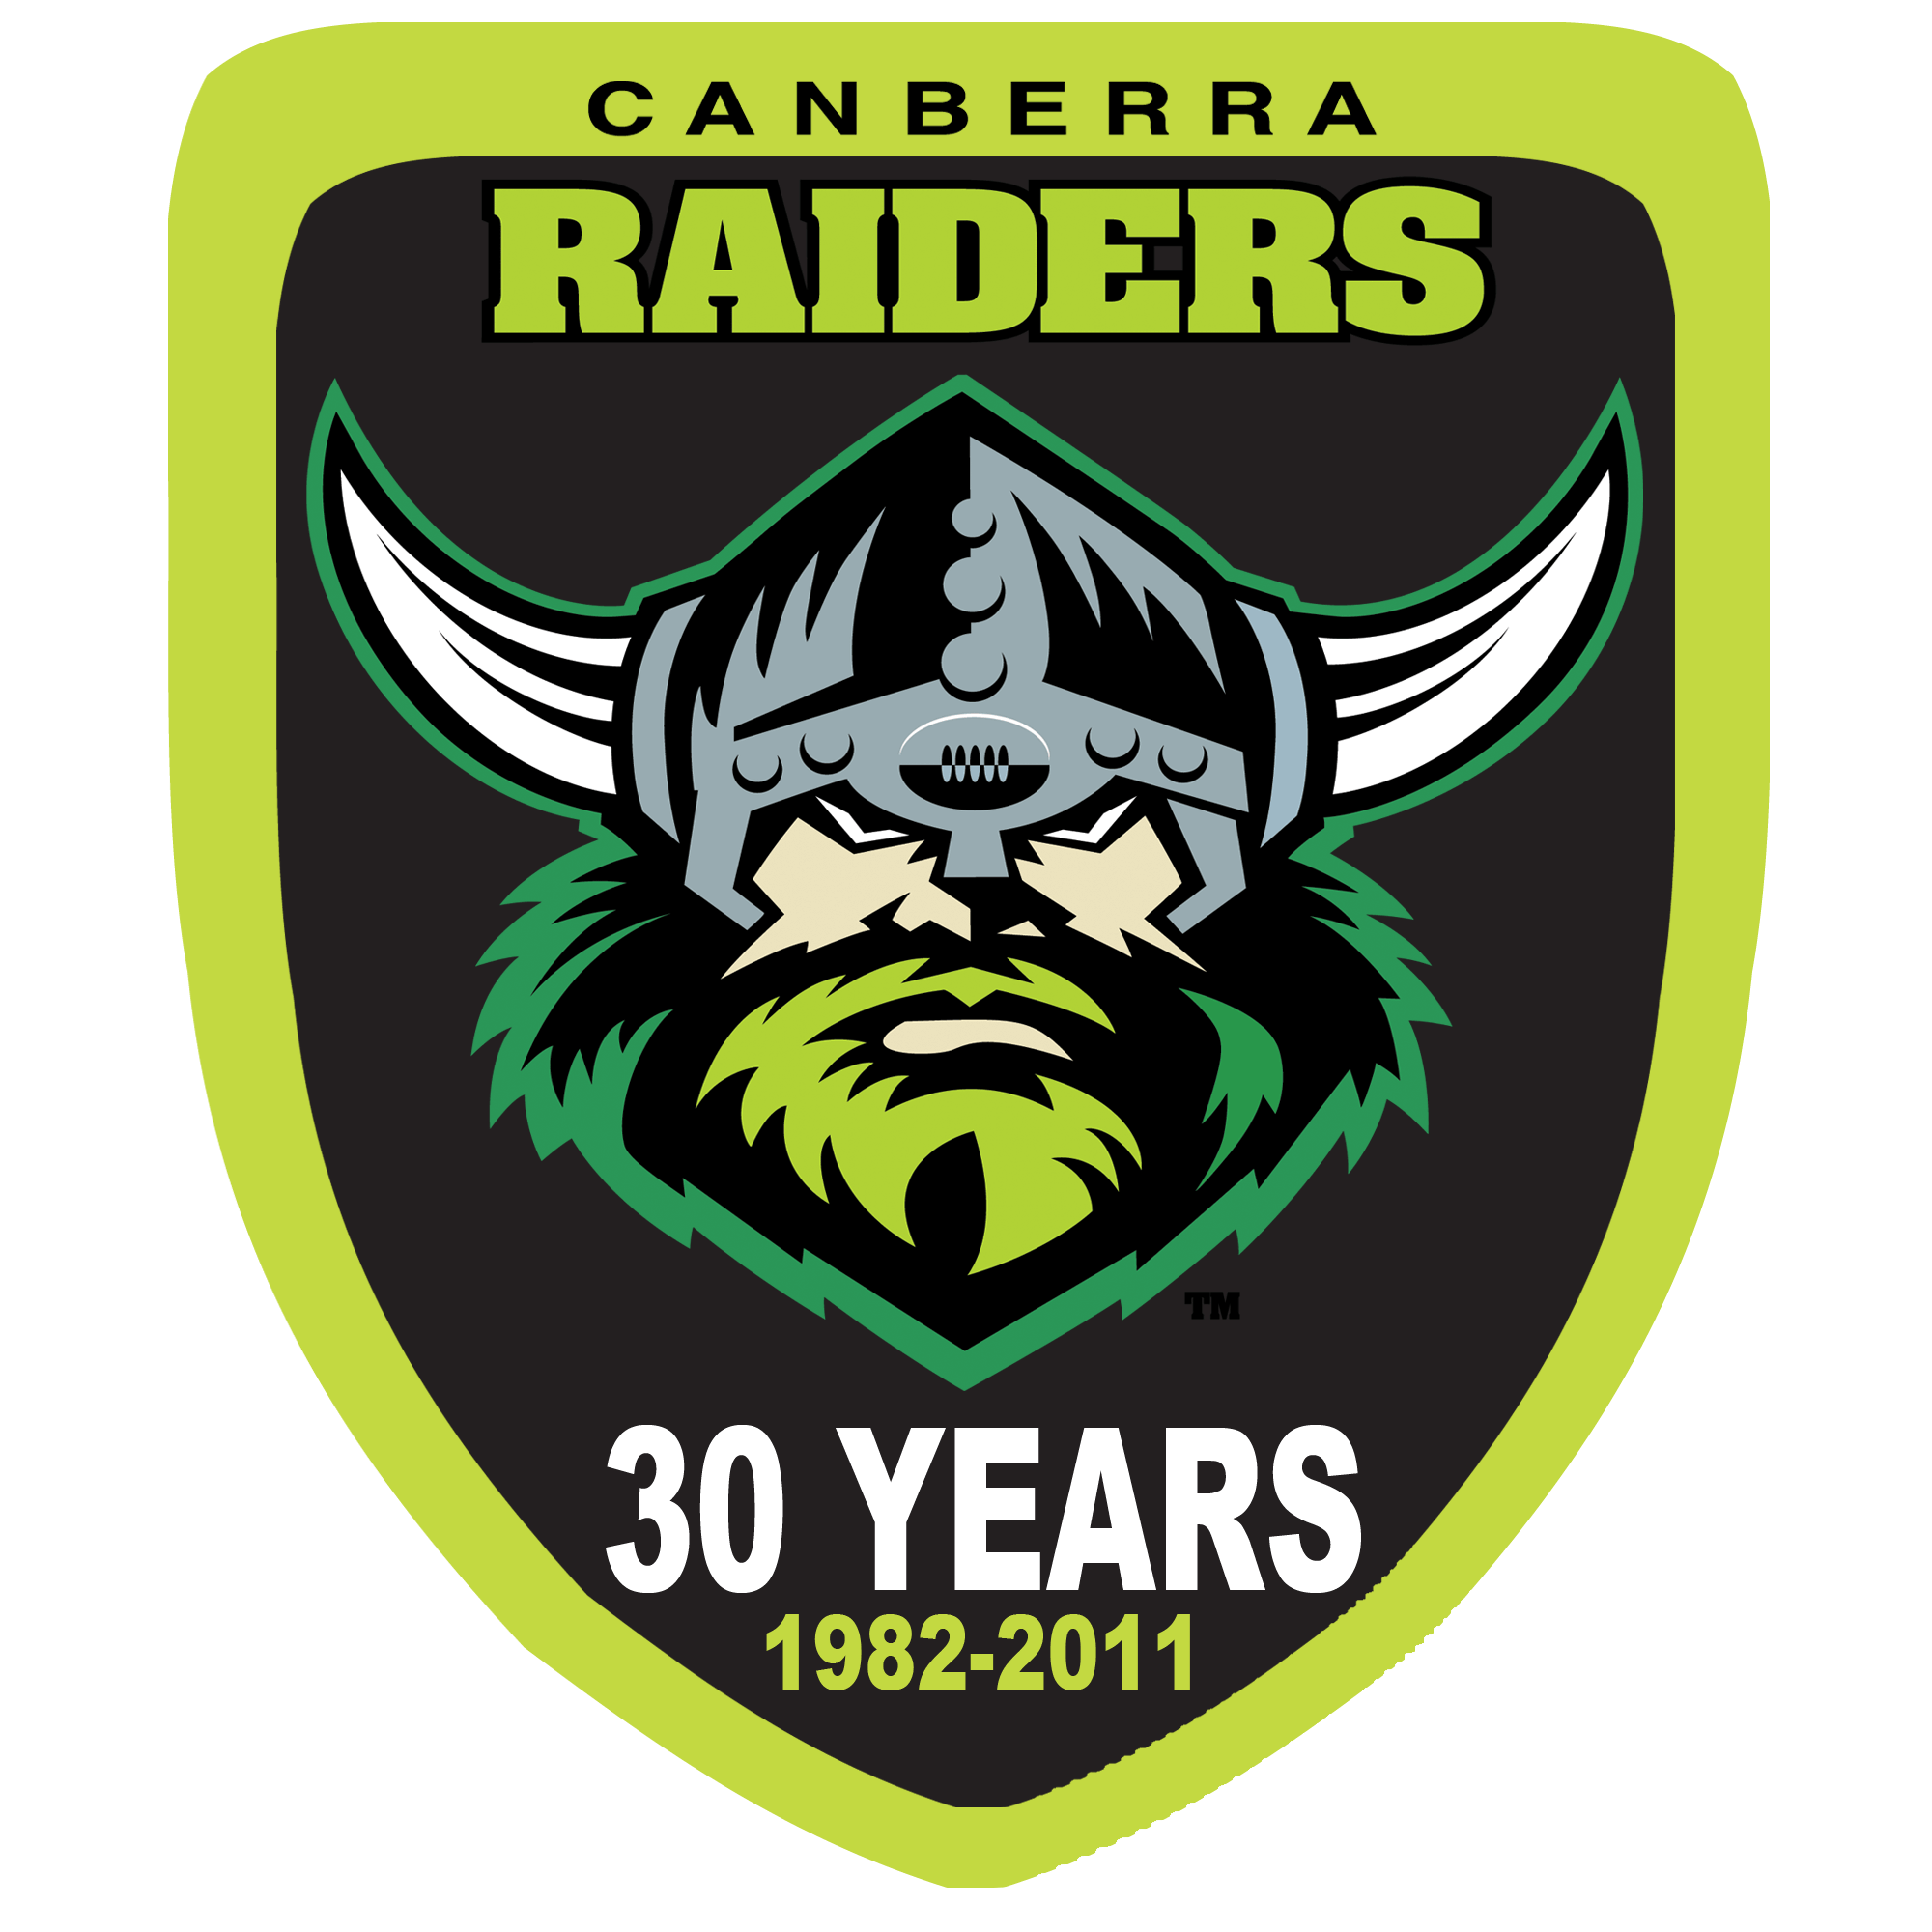 Canberra Raiders | Logopedia | FANDOM powered by Wikia